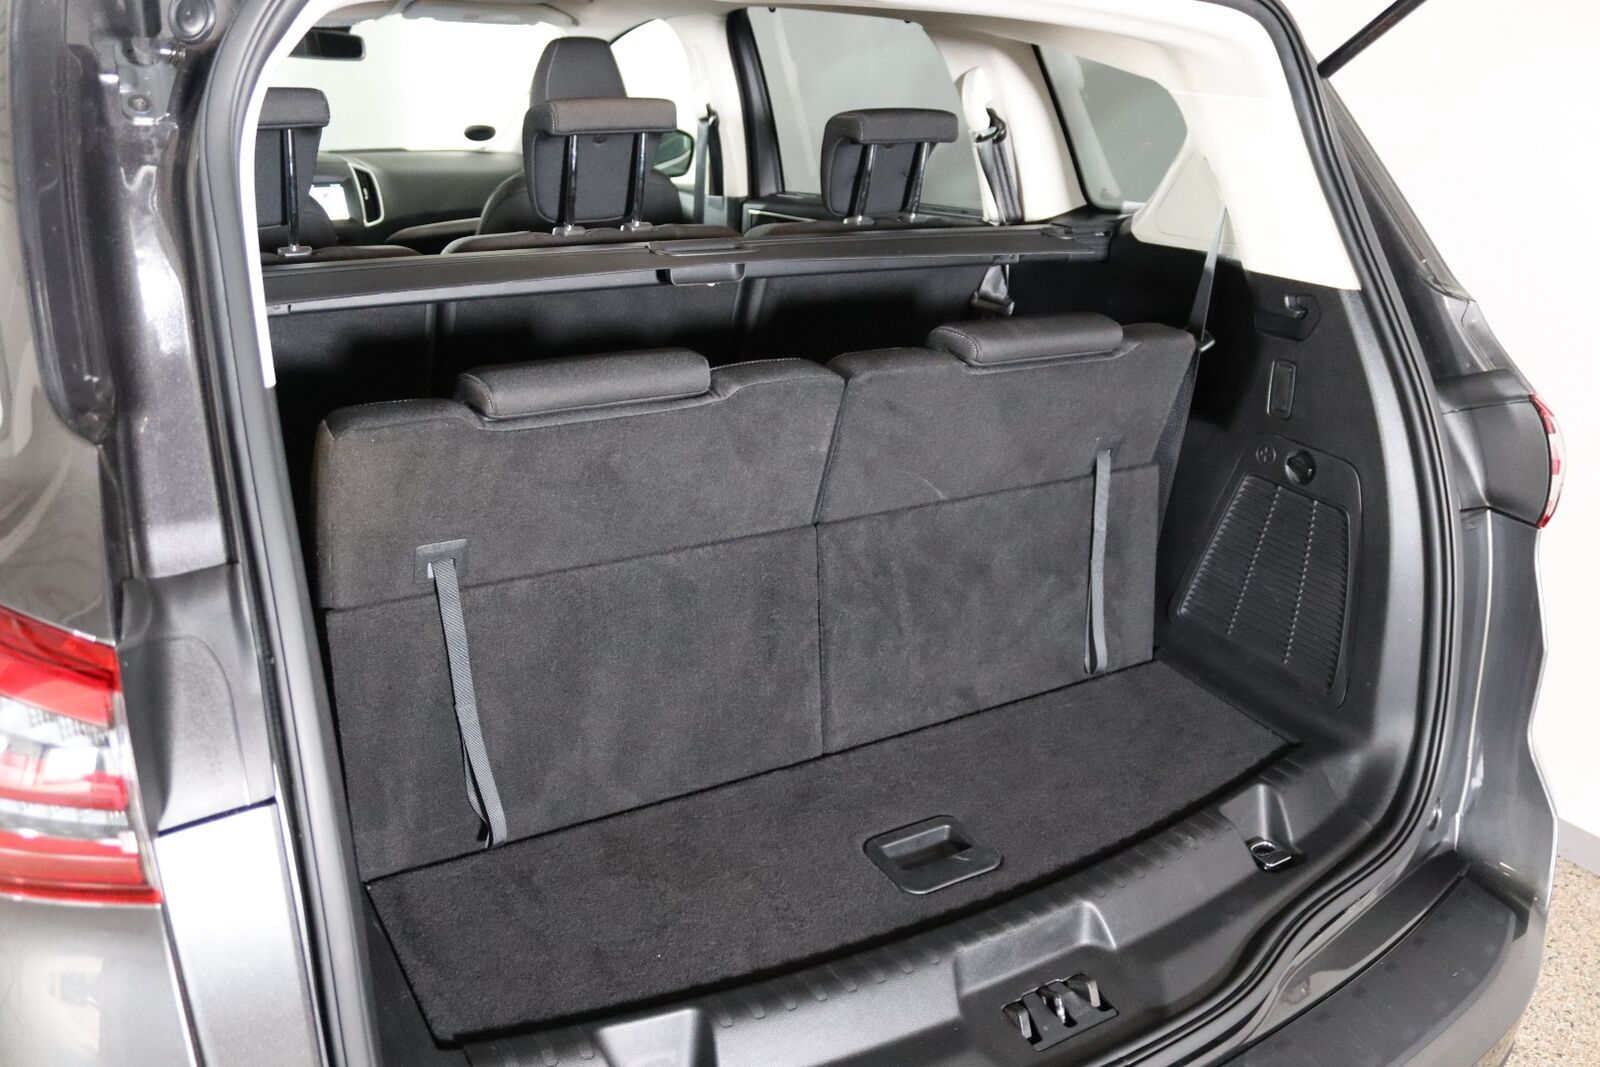 Ford S-MAX 2,0 TDCi 150 Titanium aut. 7prs - billede 8